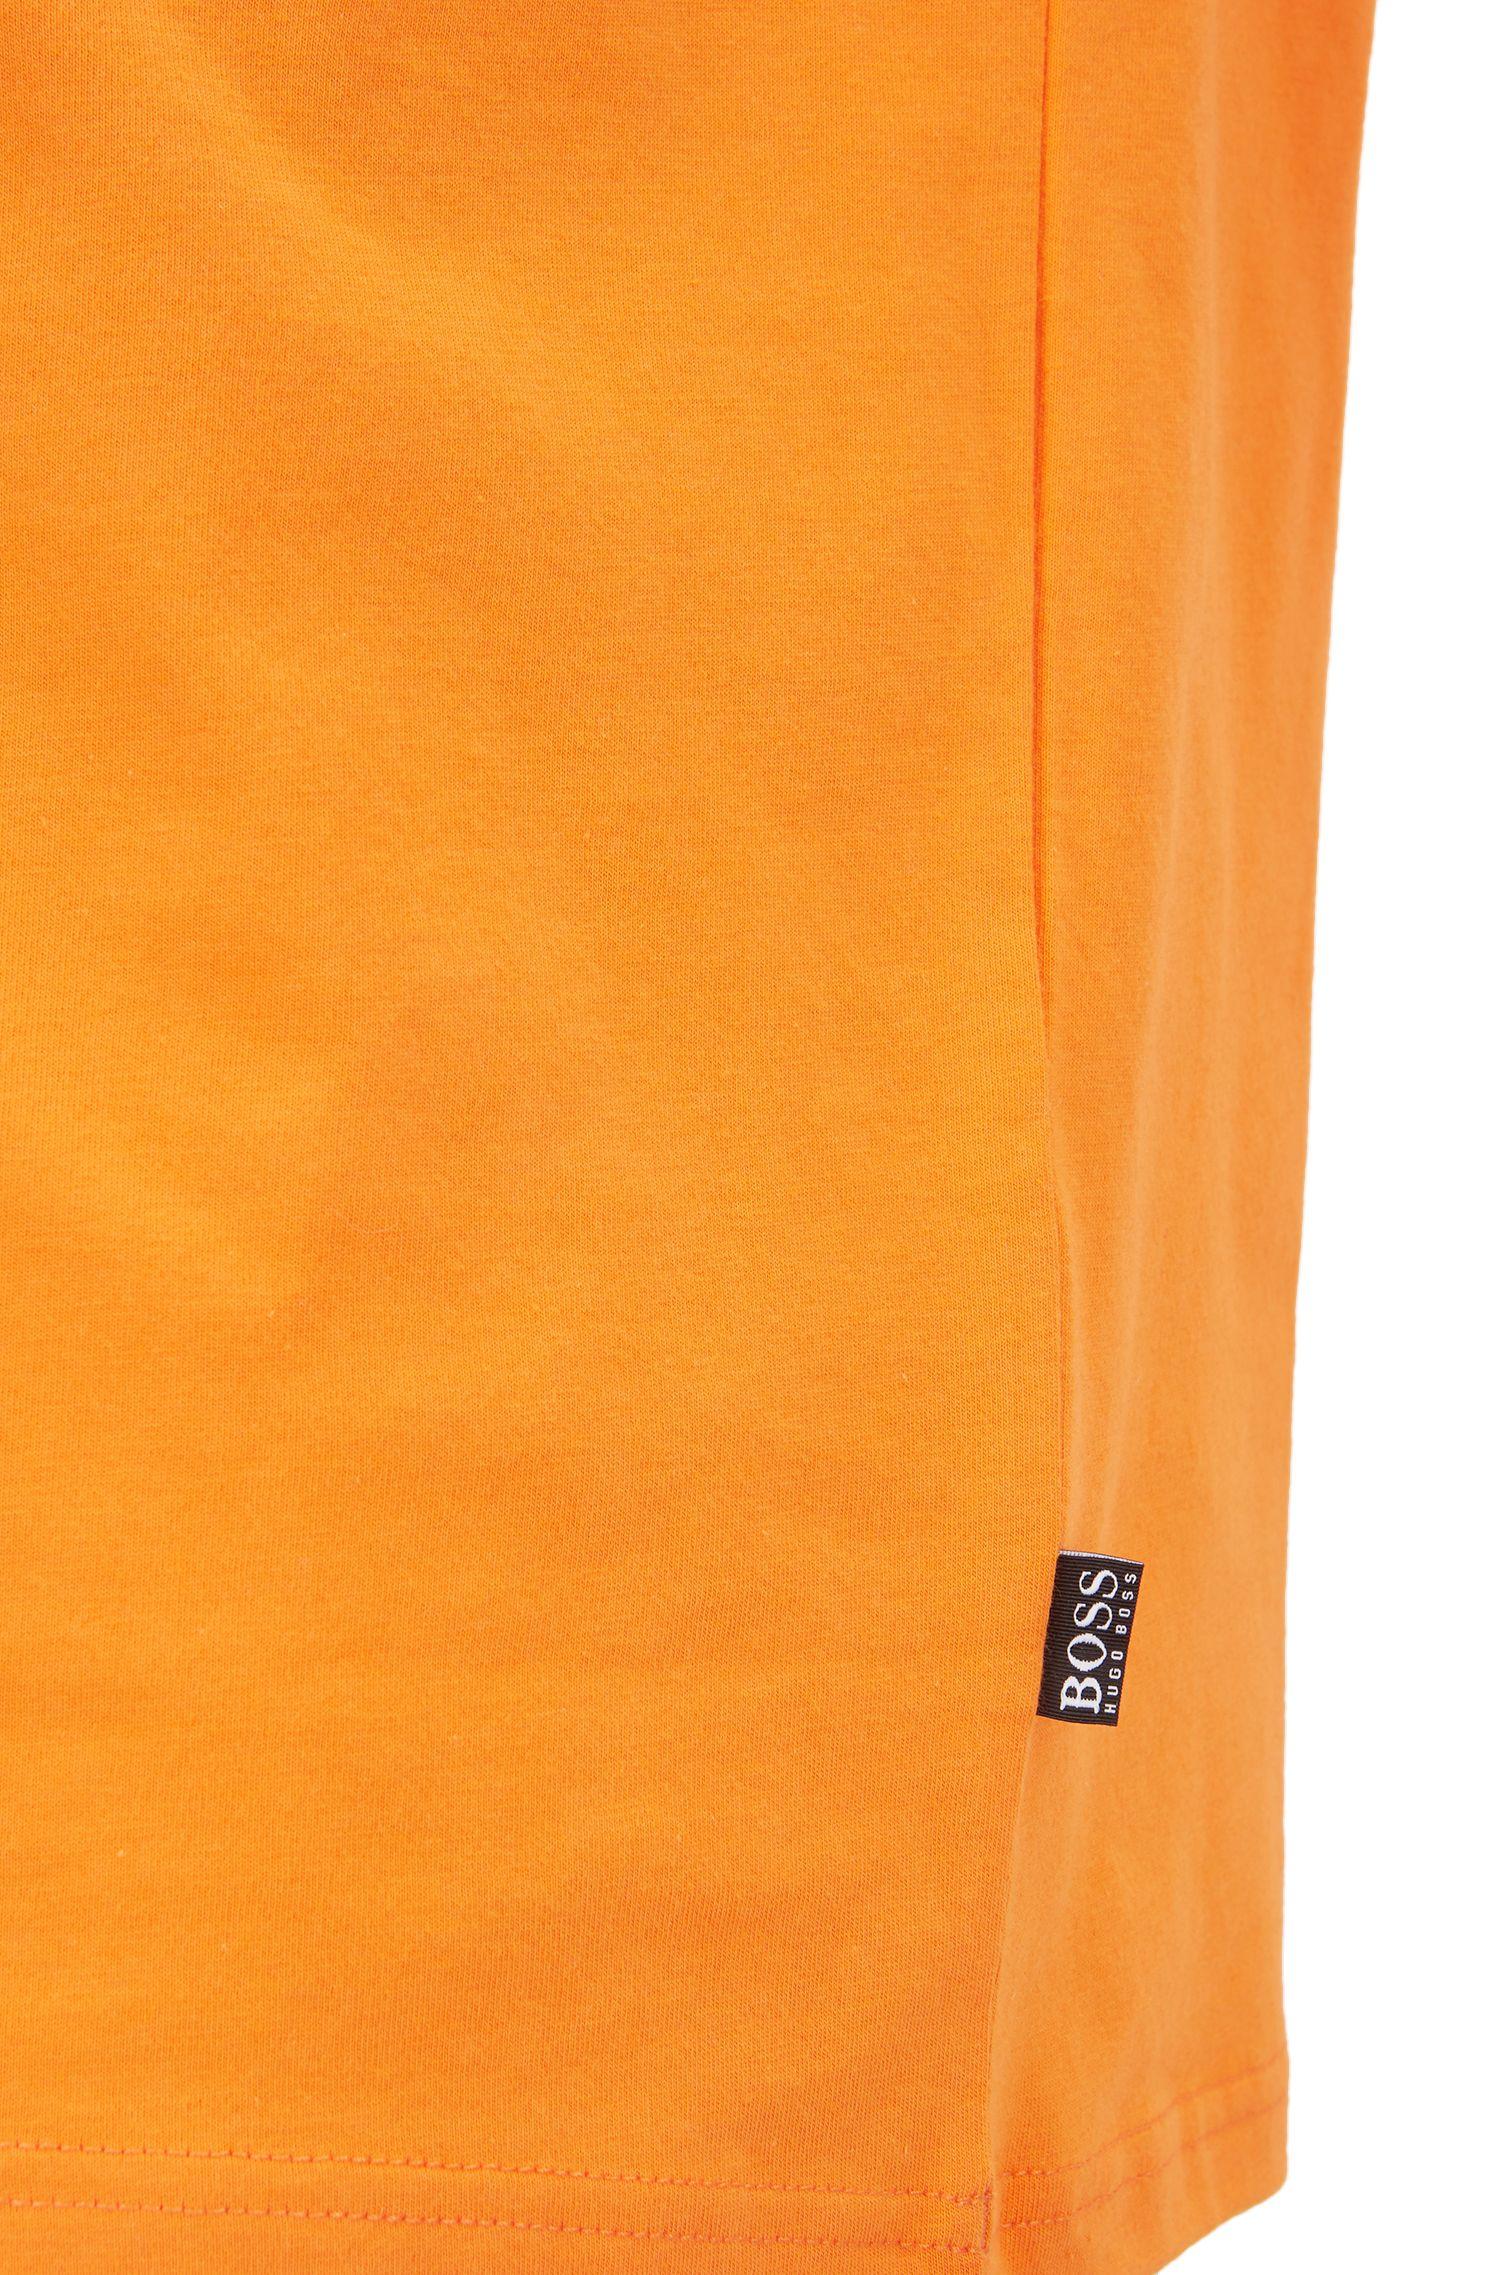 T-shirt Relaxed Fit en coton avec protection anti-UV, Orange